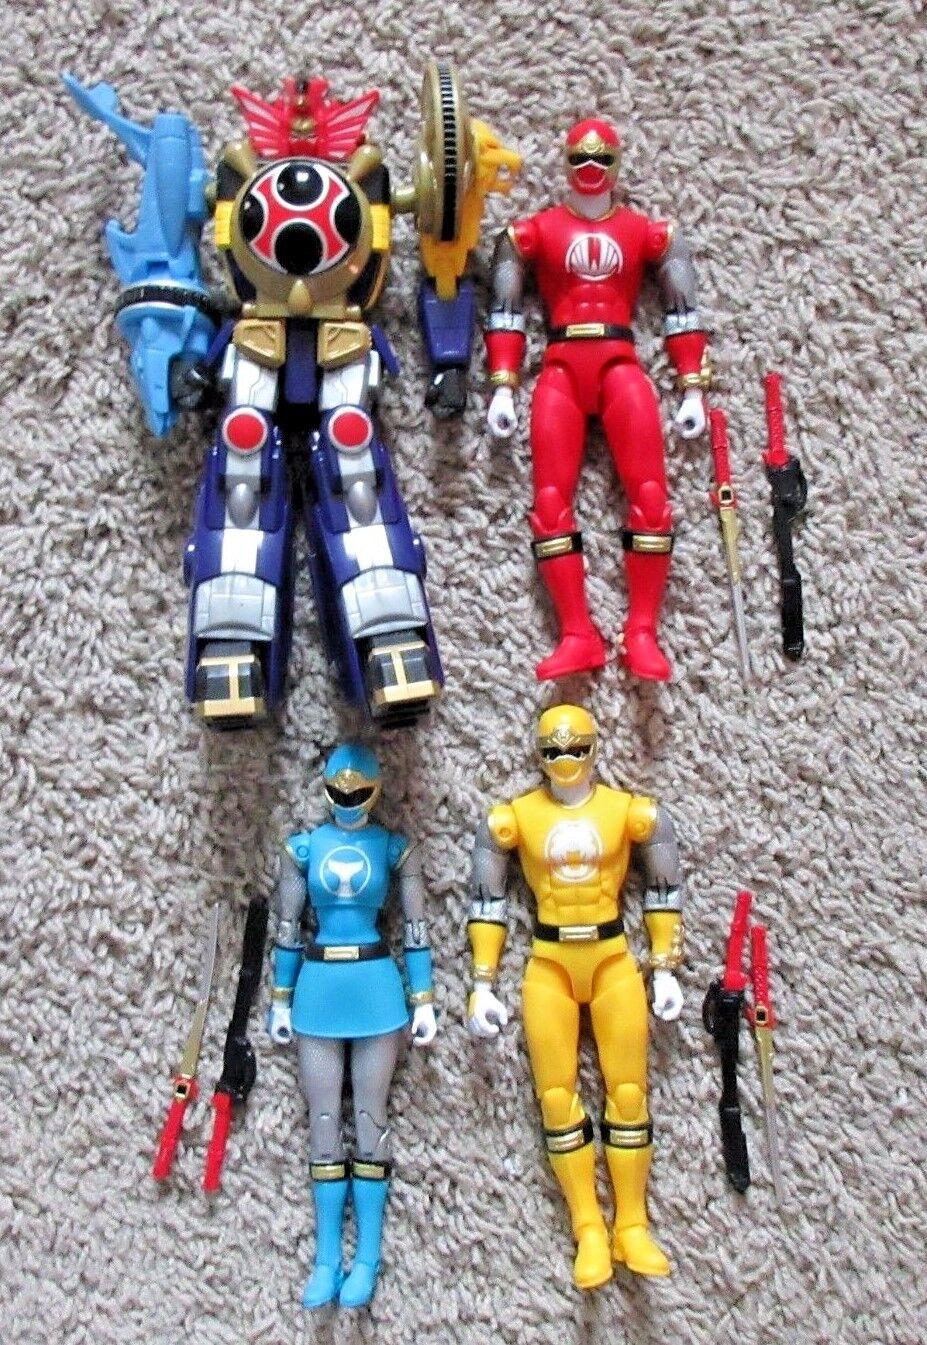 alto descuento Power Rangers Ninja Force Force Force Legacy Lote 4 Megazord Azul Rojo Amarillo Set Baf  despacho de tienda